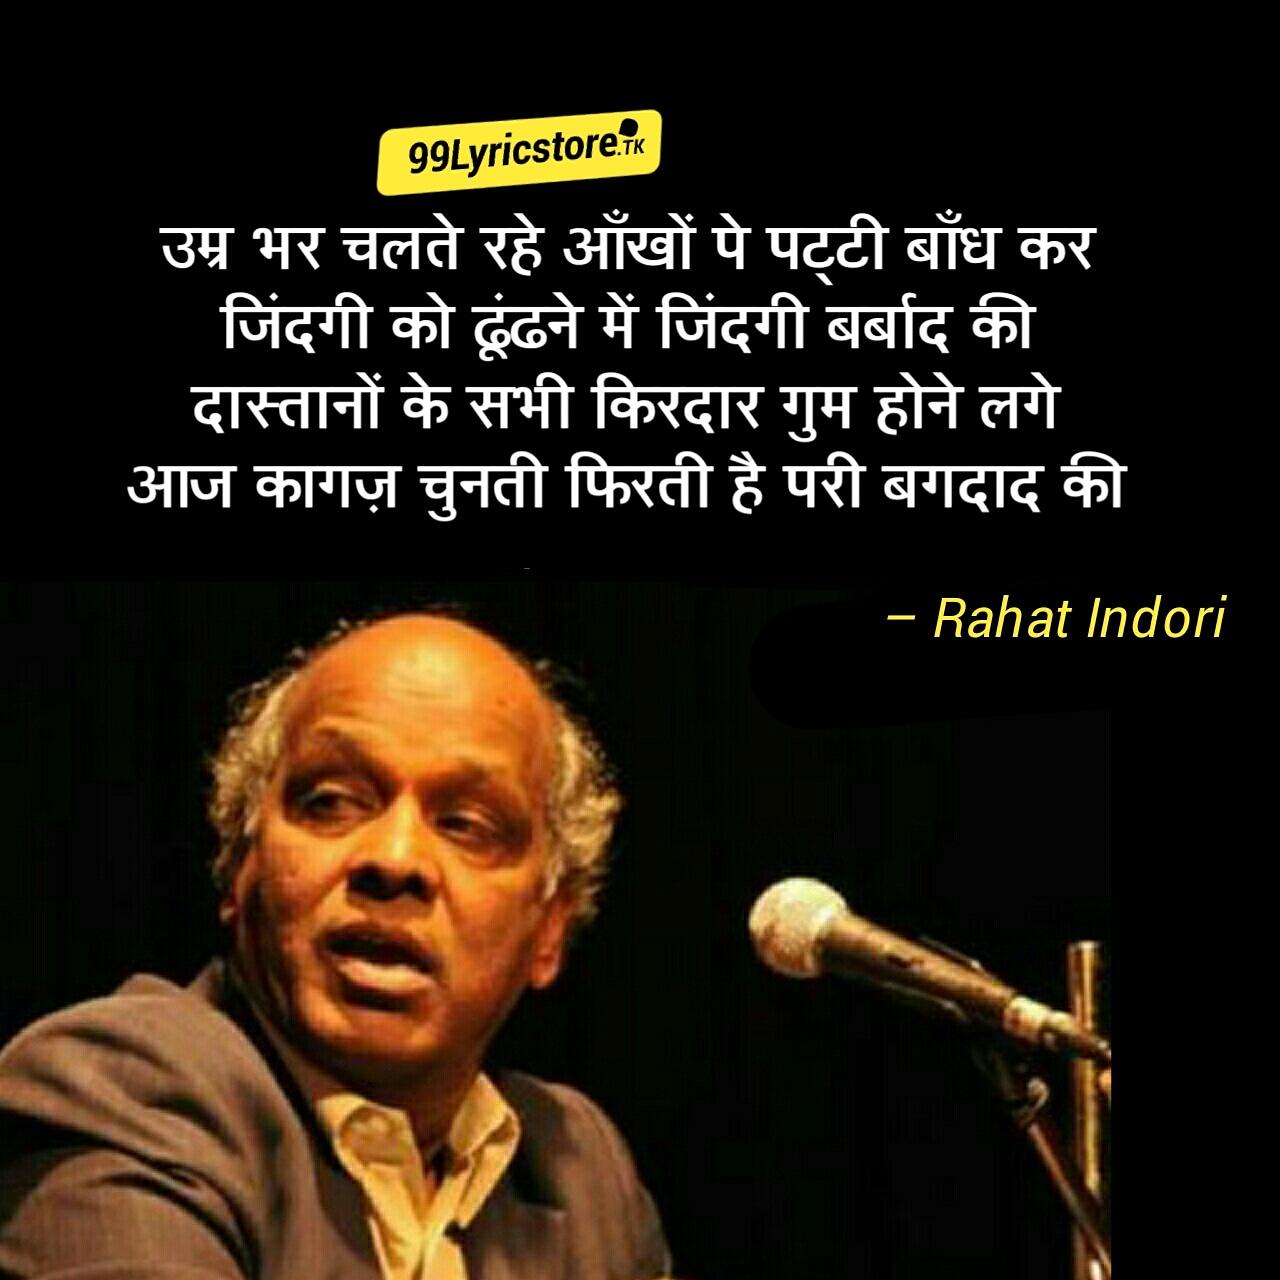 Mere Kaarobar Me Sabne Badi Imdaad Ki' written and performed by Rahat Indori. This poetry is best Ghazal and Shayari of Rahat Indori.